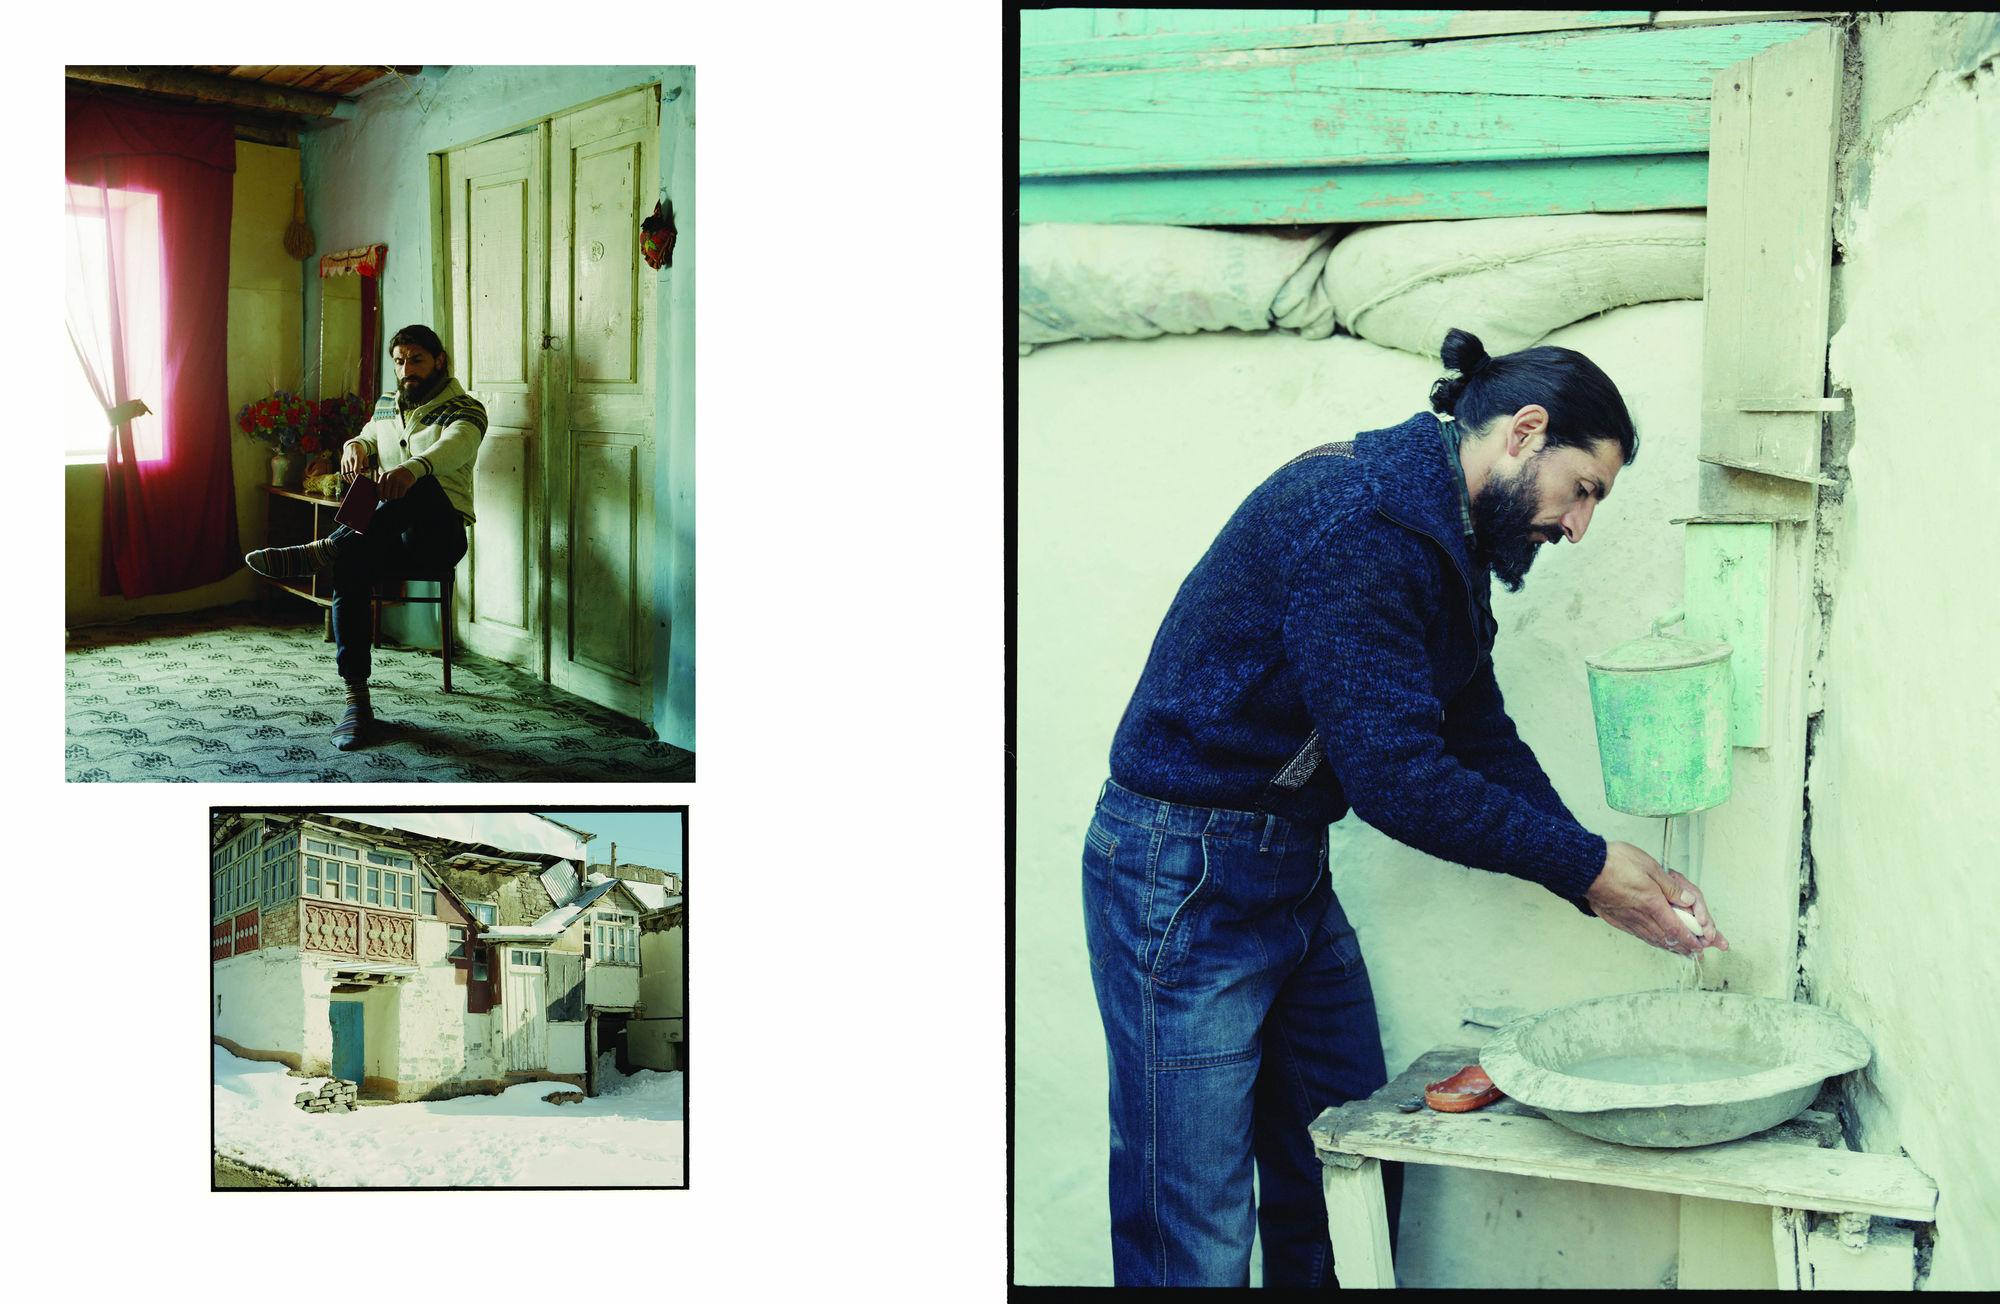 GoSeeAWARDS15 - REPORTAGE SILVER for YILMAZ AKTEPE